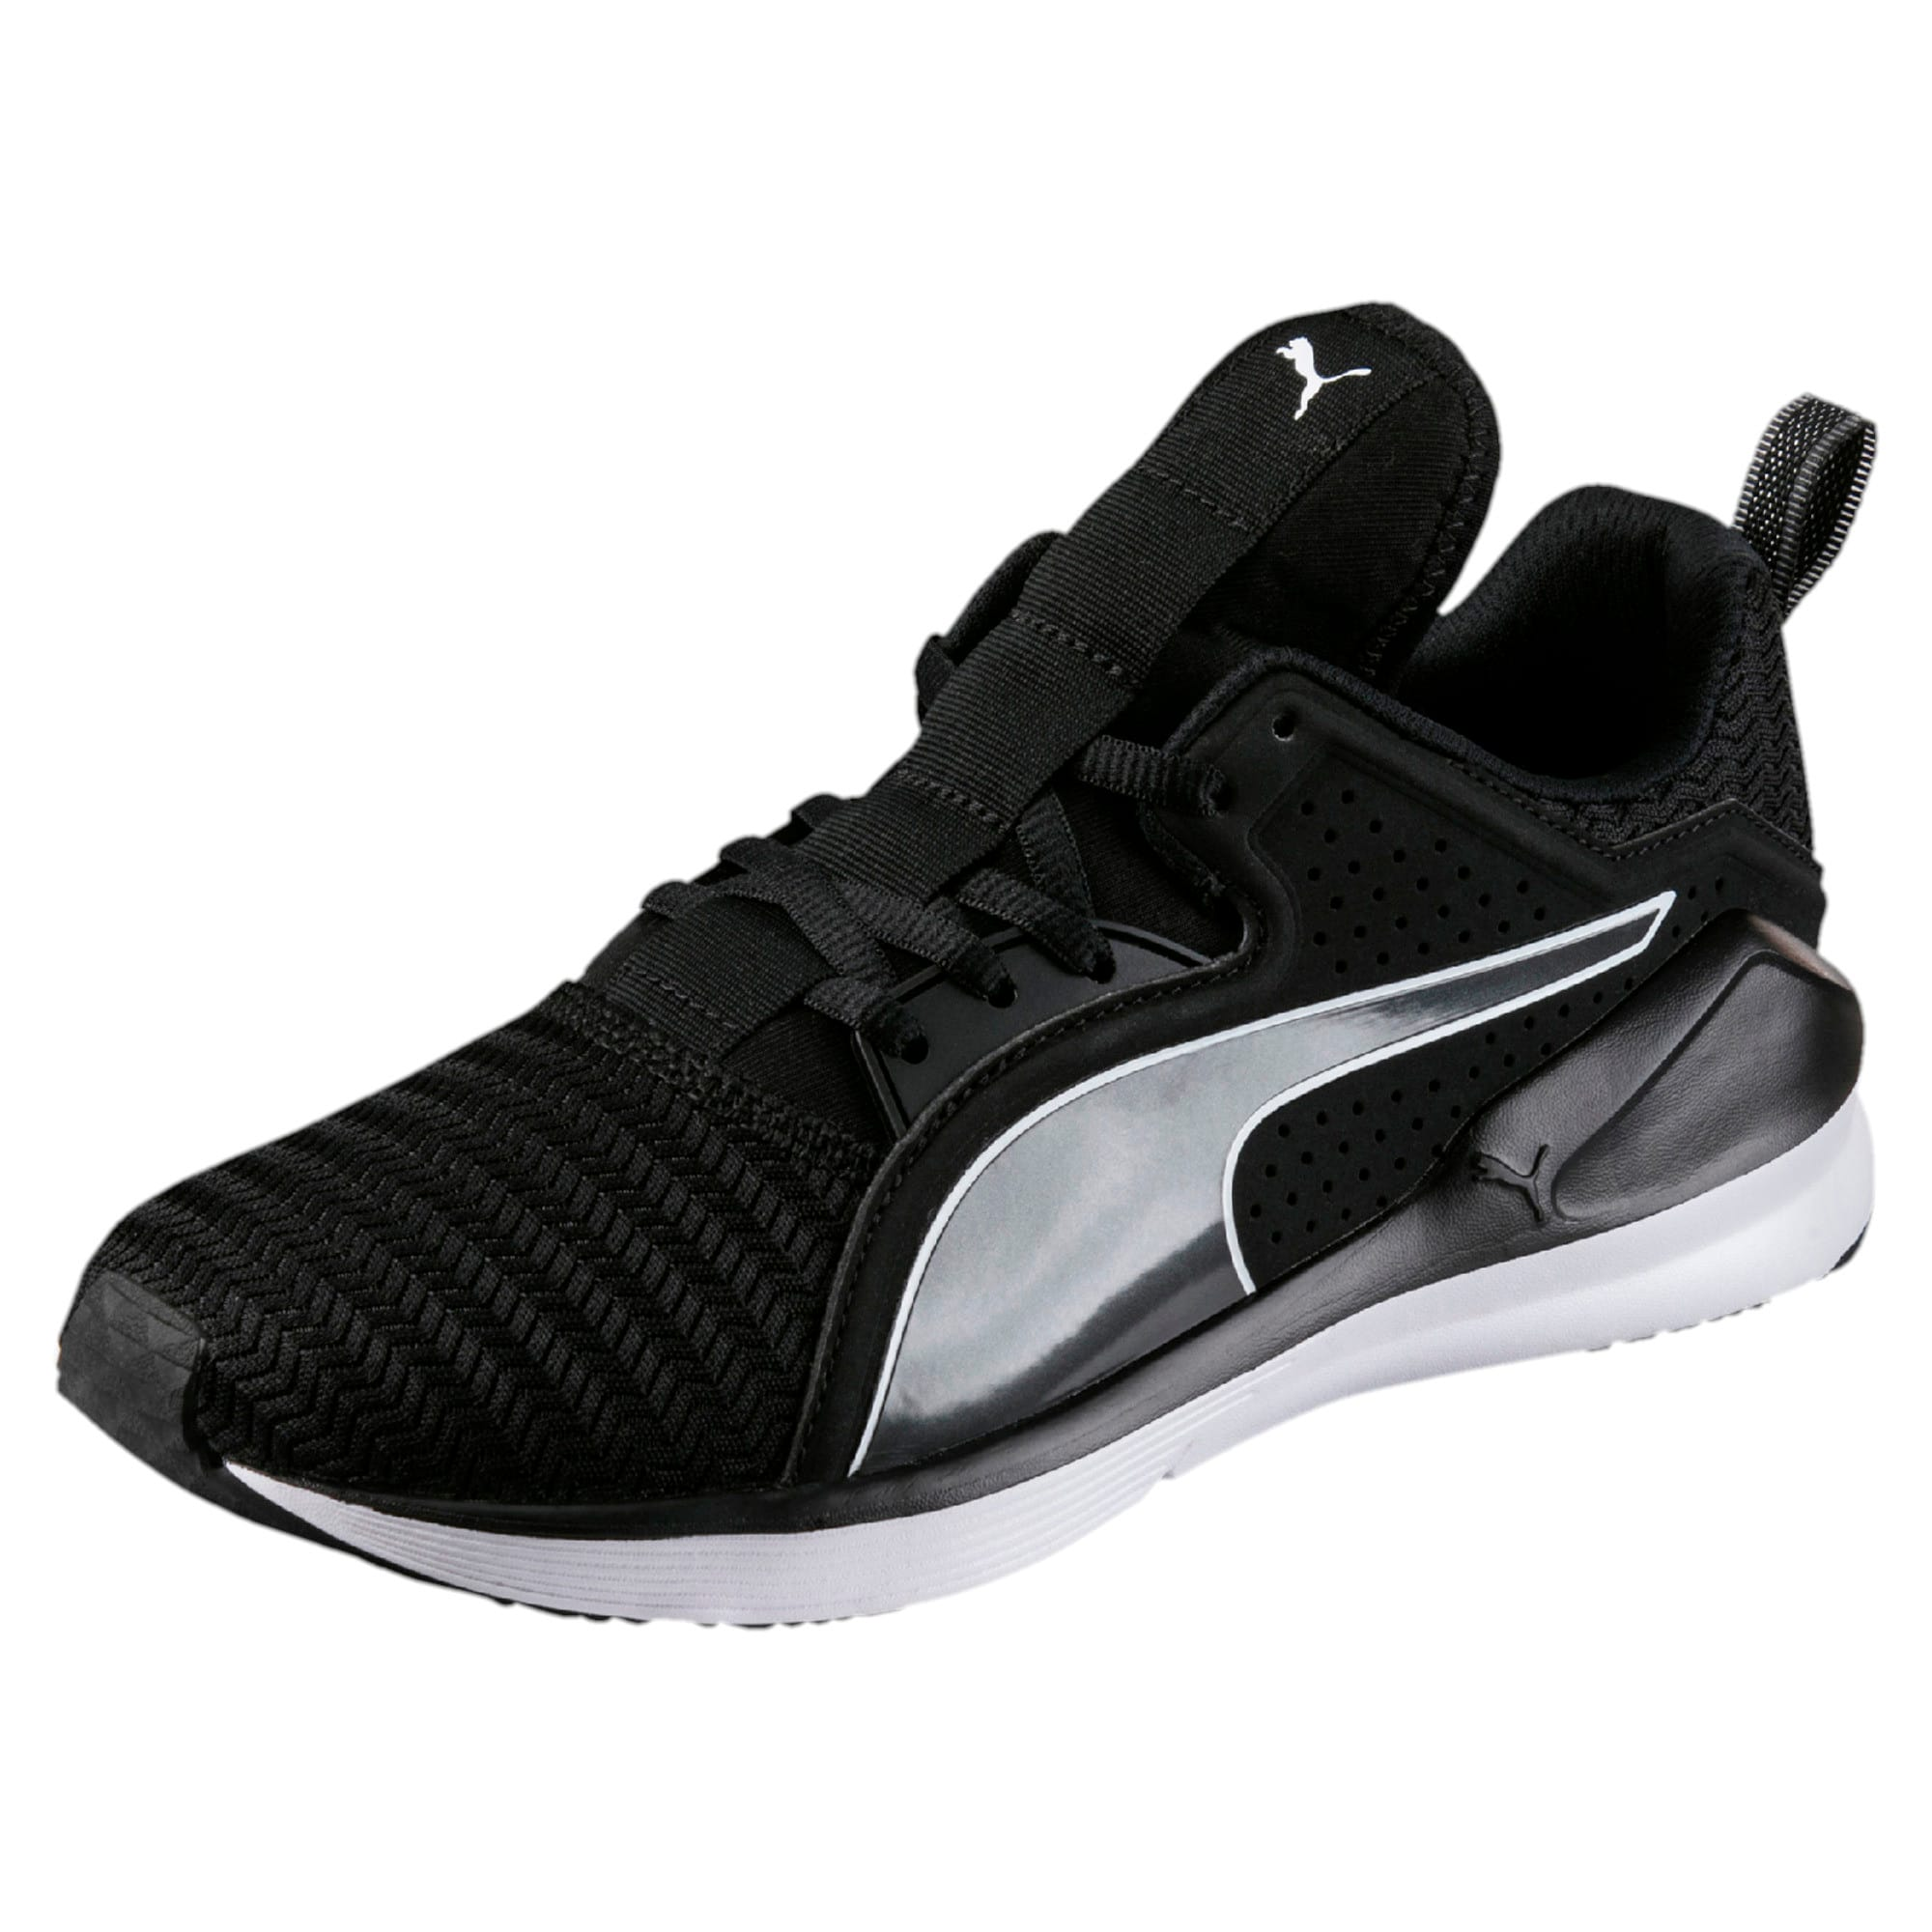 Thumbnail 1 of Fierce Lace Core Women's Training Shoes, Puma Black-Puma White, medium-IND